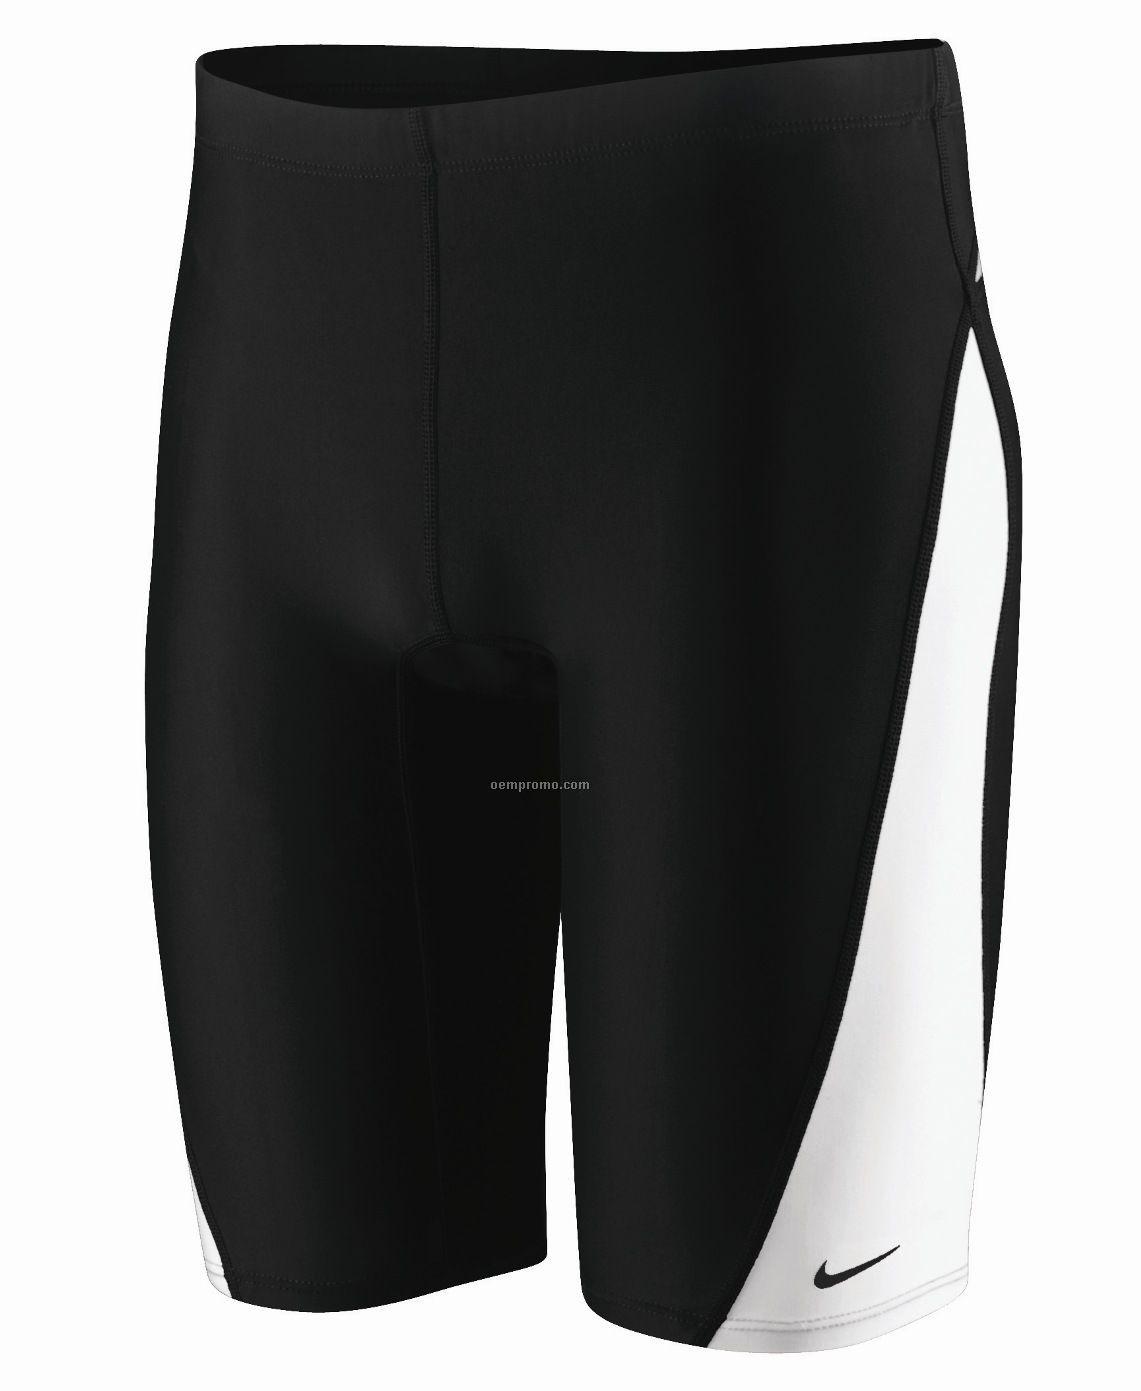 Nike Core Splice Jammer Swim Trunks (Adult - 30-38)